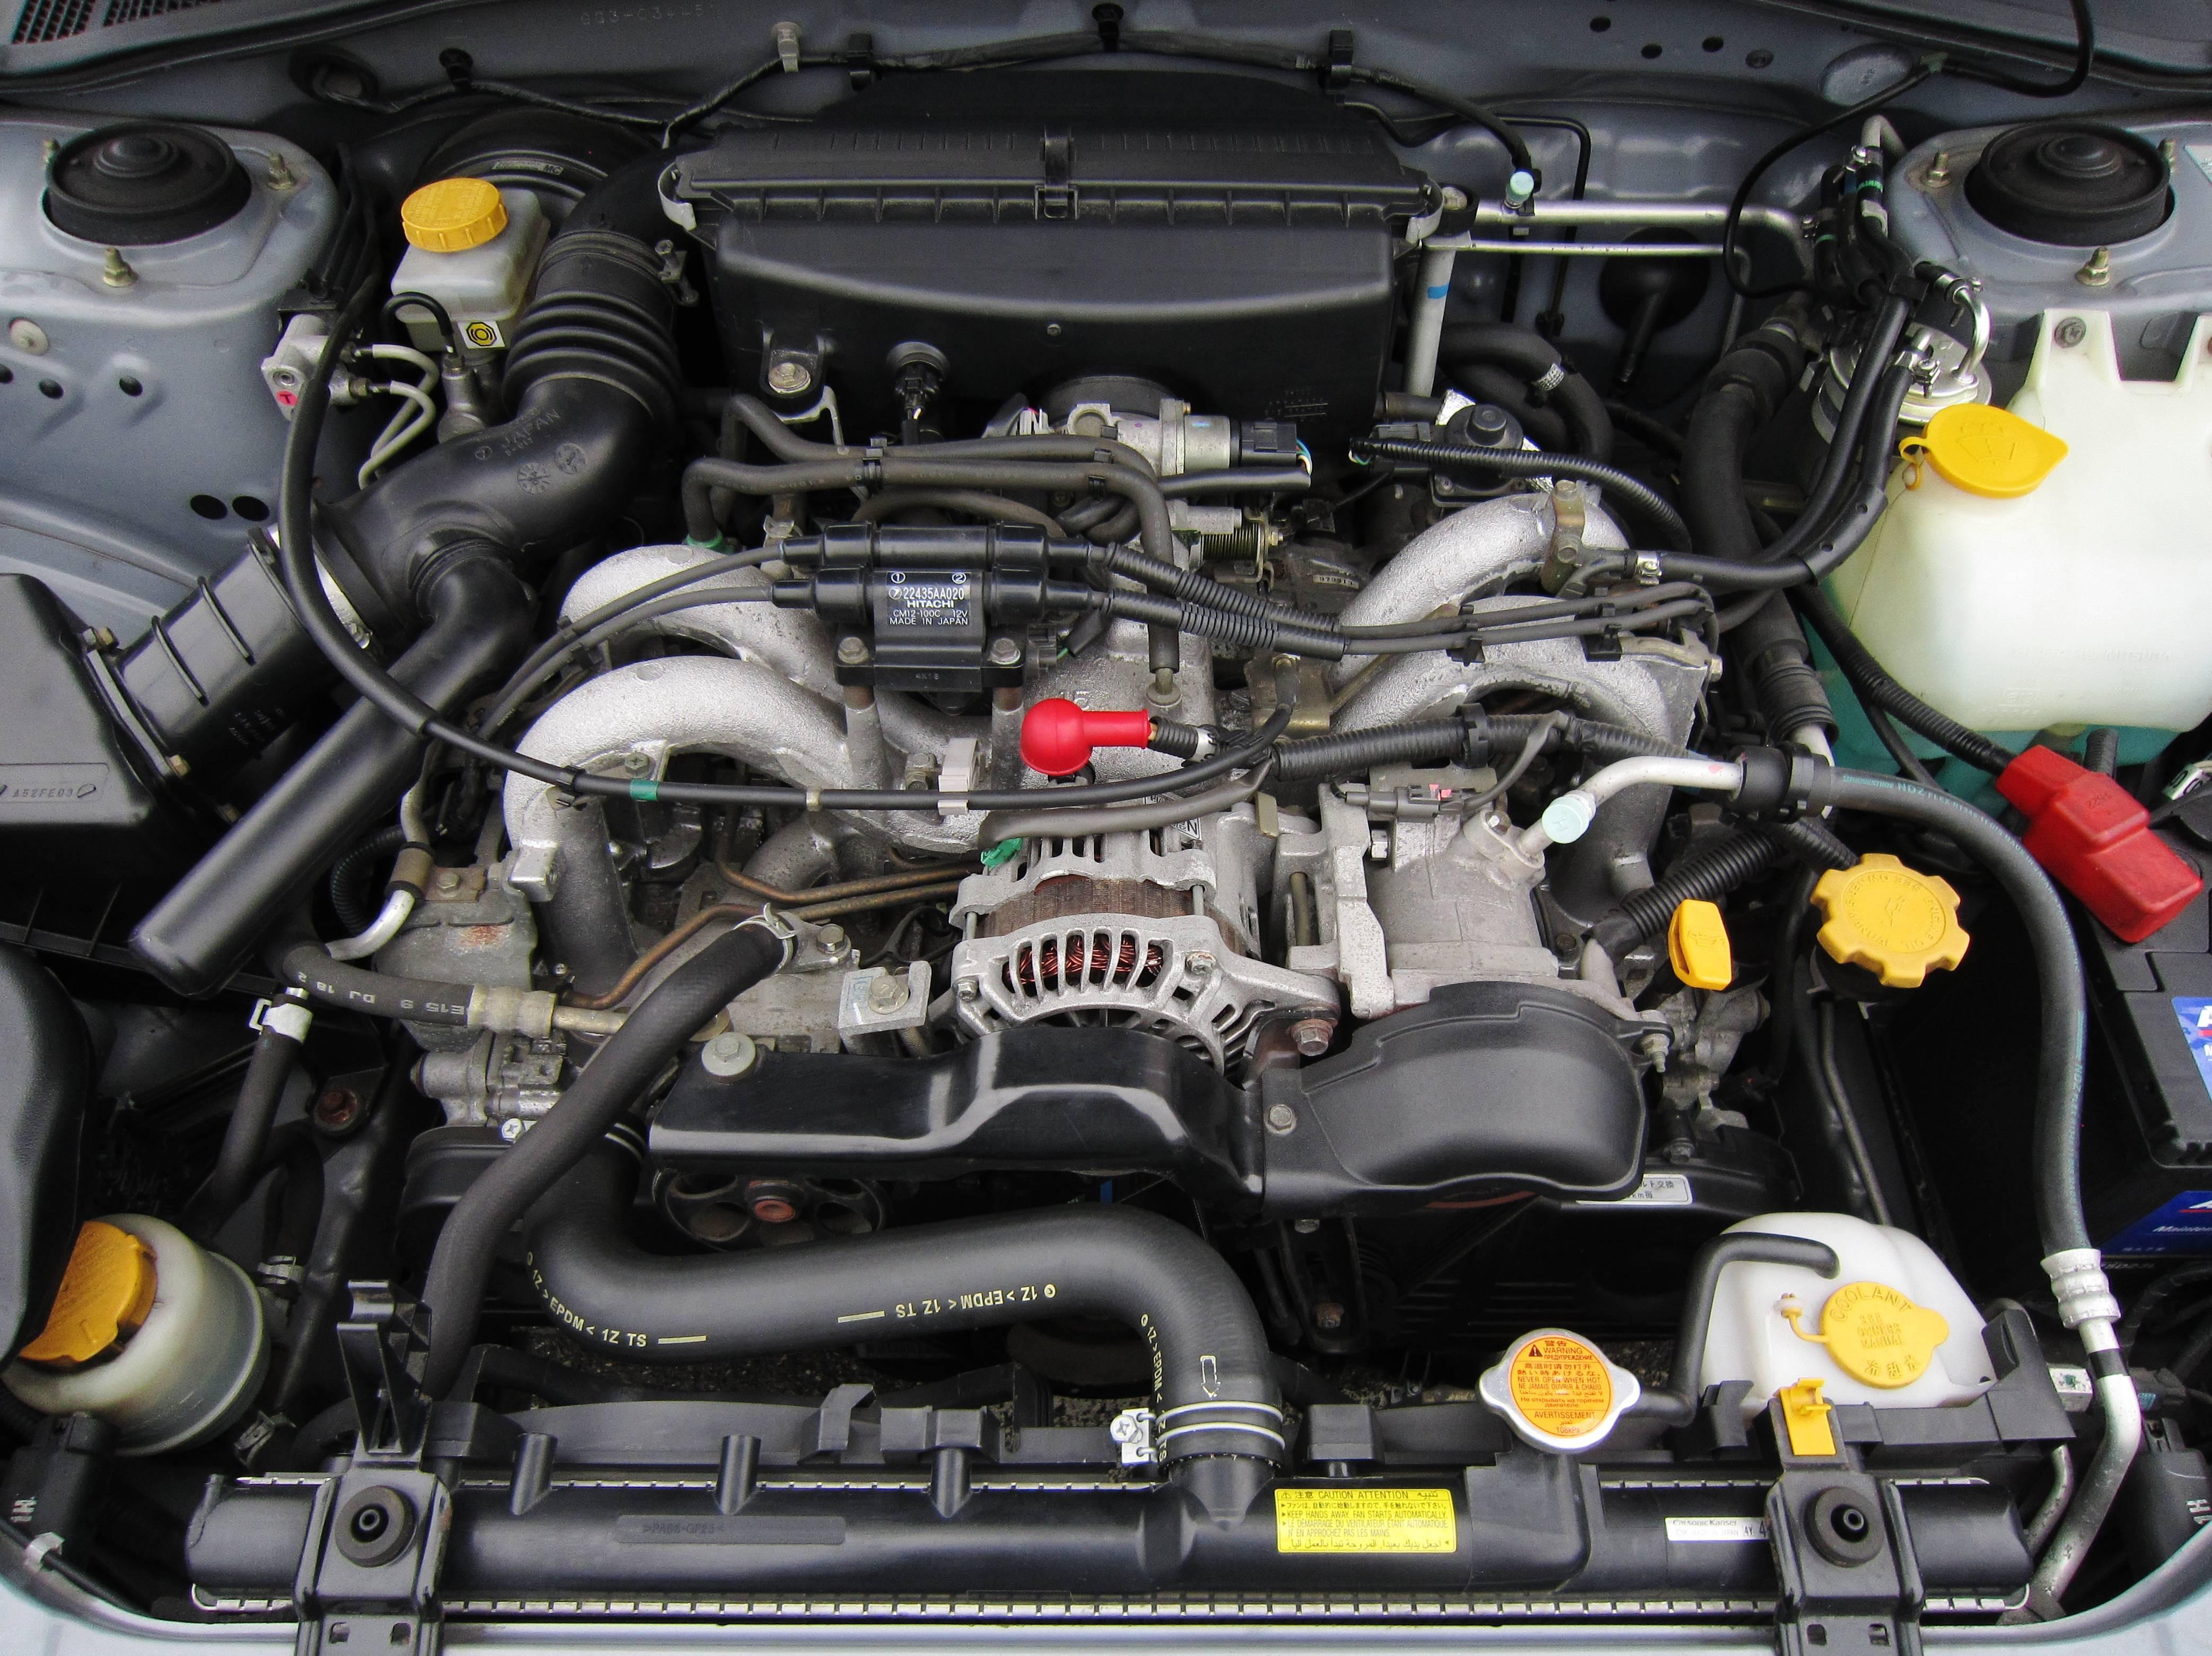 Subaru Impreza Engine Diagram File 2004 Subaru Impreza Sport Wagon Ej15 Engine Wikimedia Mons